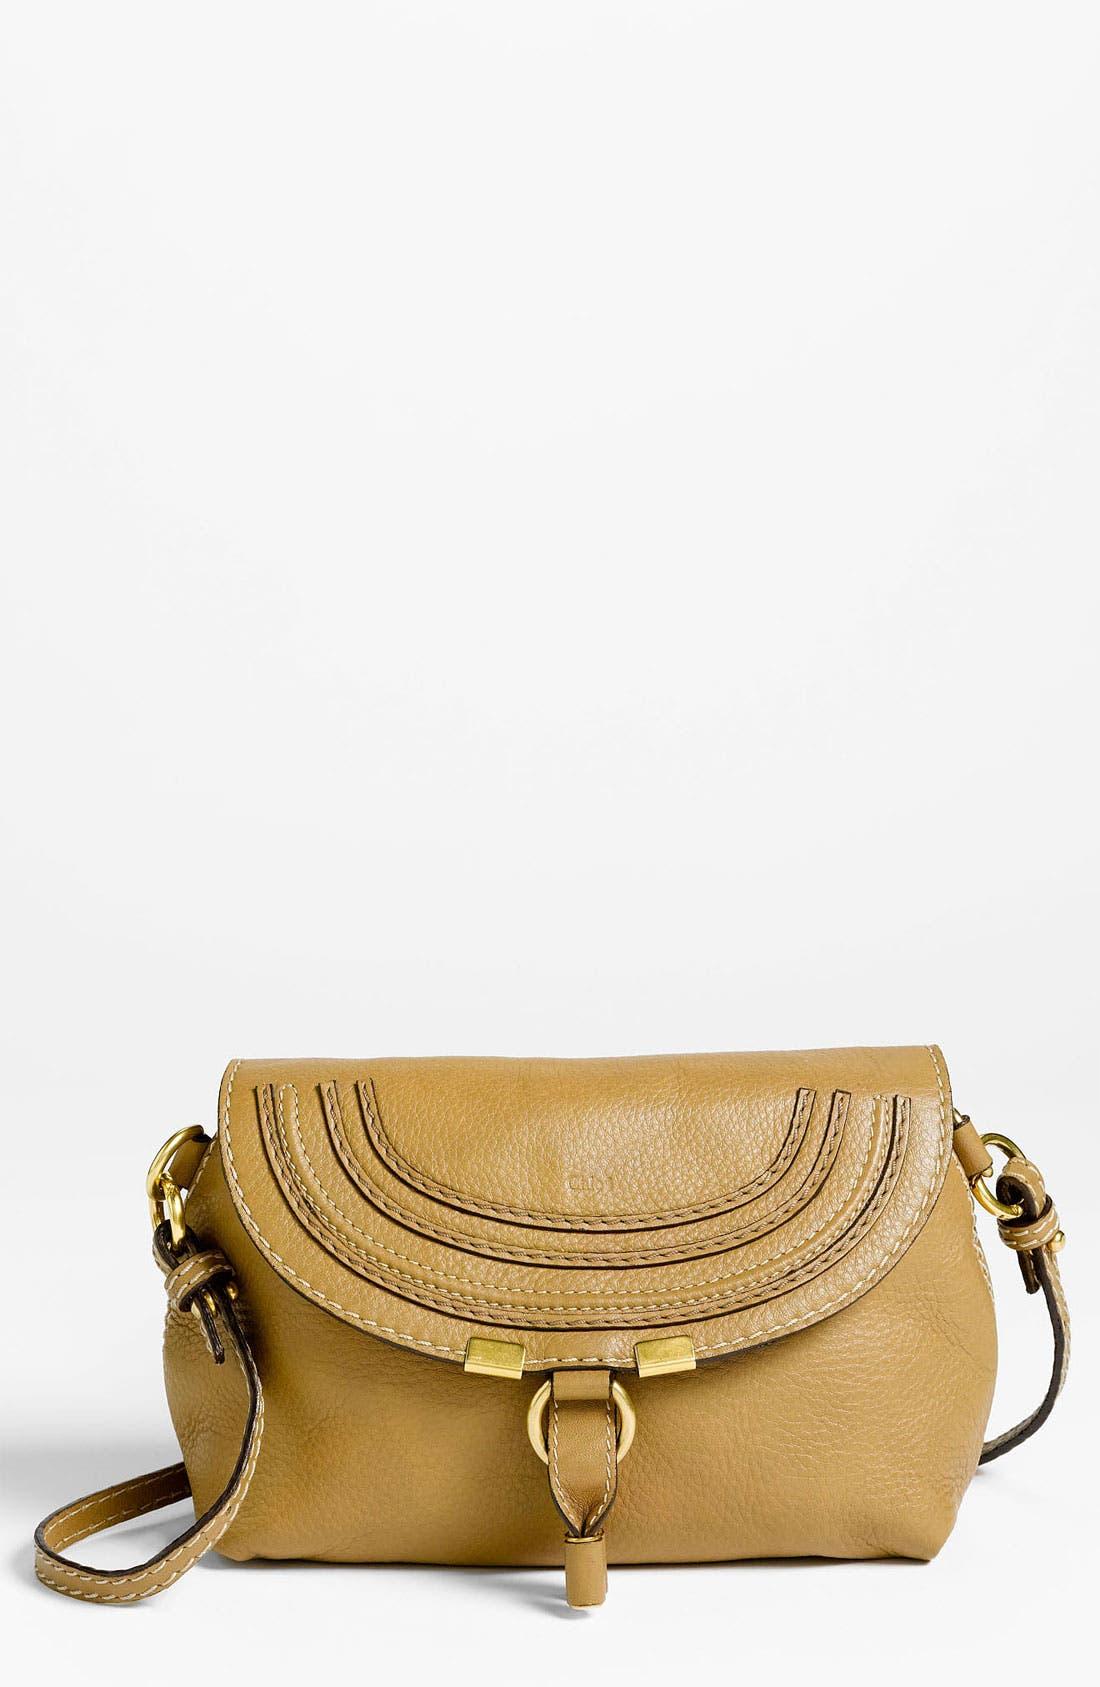 Alternate Image 1 Selected - Chloé 'Marcie' Calfskin Leather Crossbody Bag